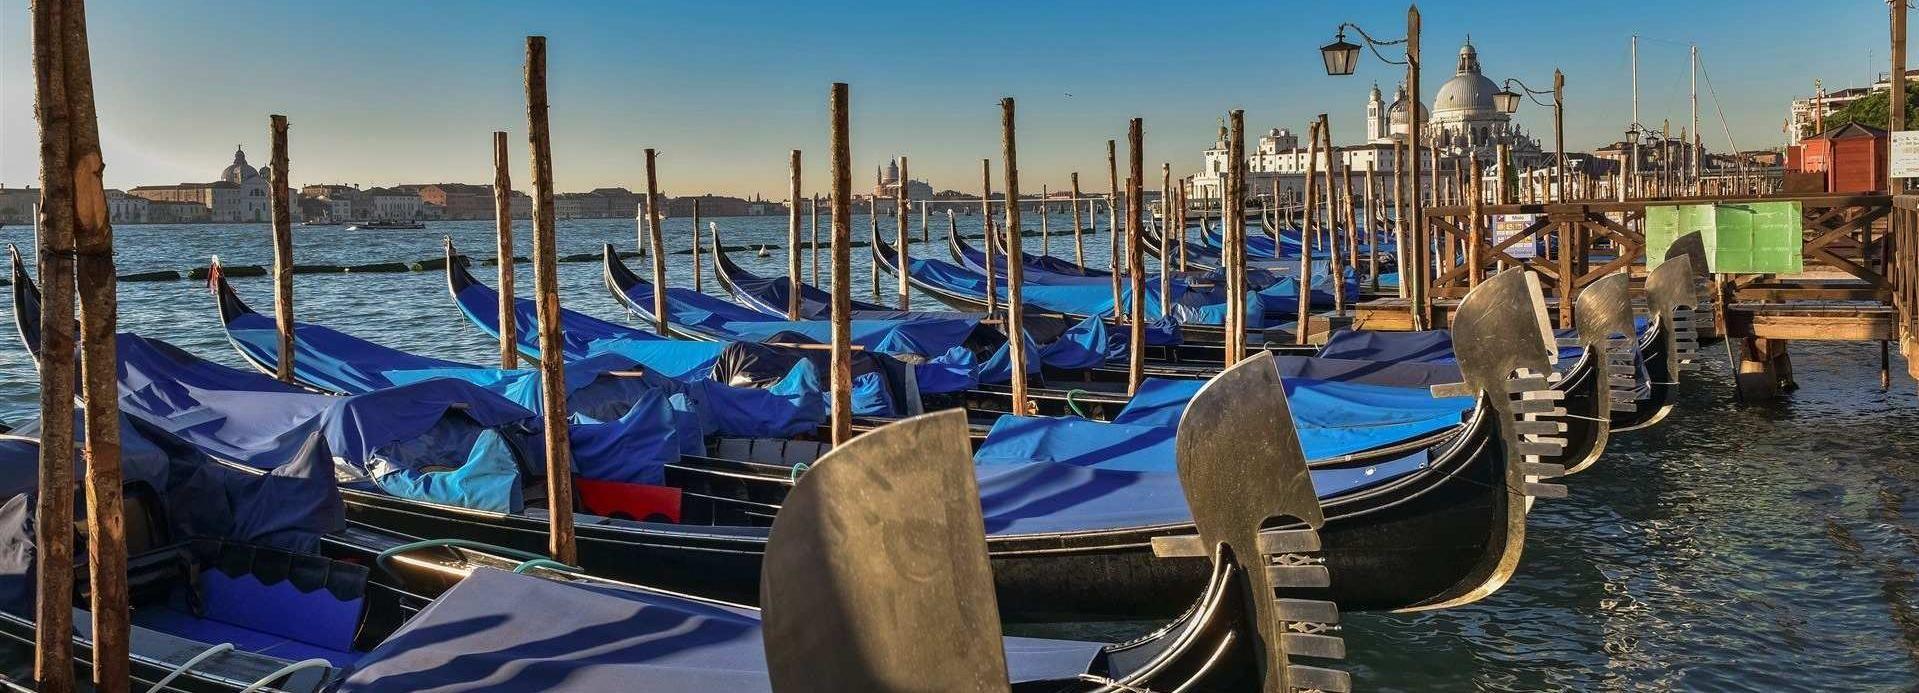 Venedig: Gondelfahrt in Gruppen